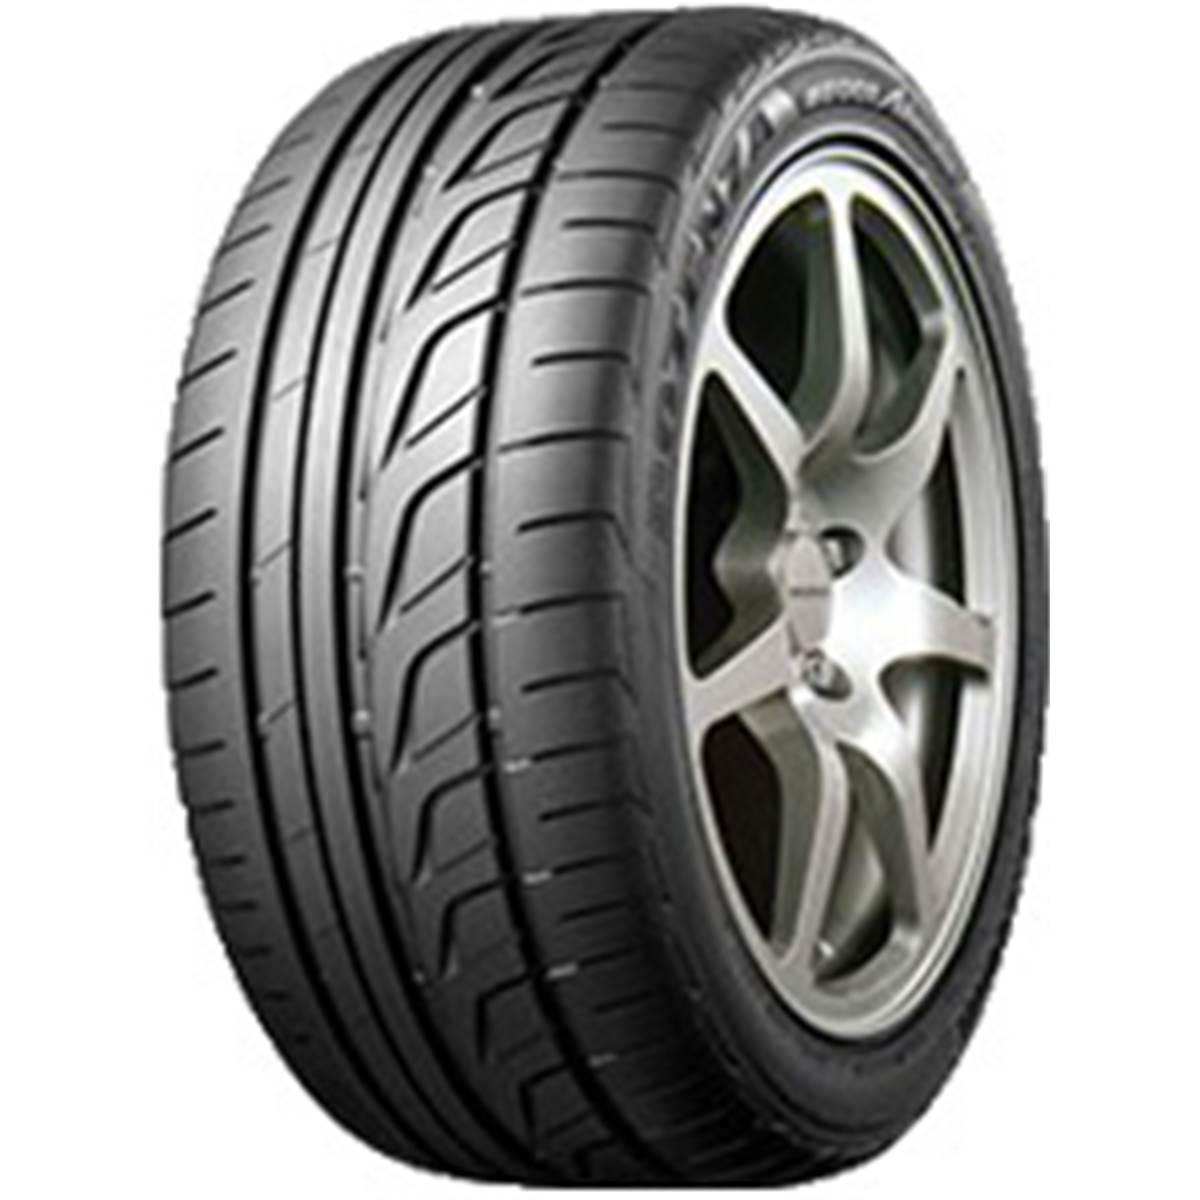 Pneu Bridgestone 225/40R18 92W Potenza Adrenalin Re002 XL